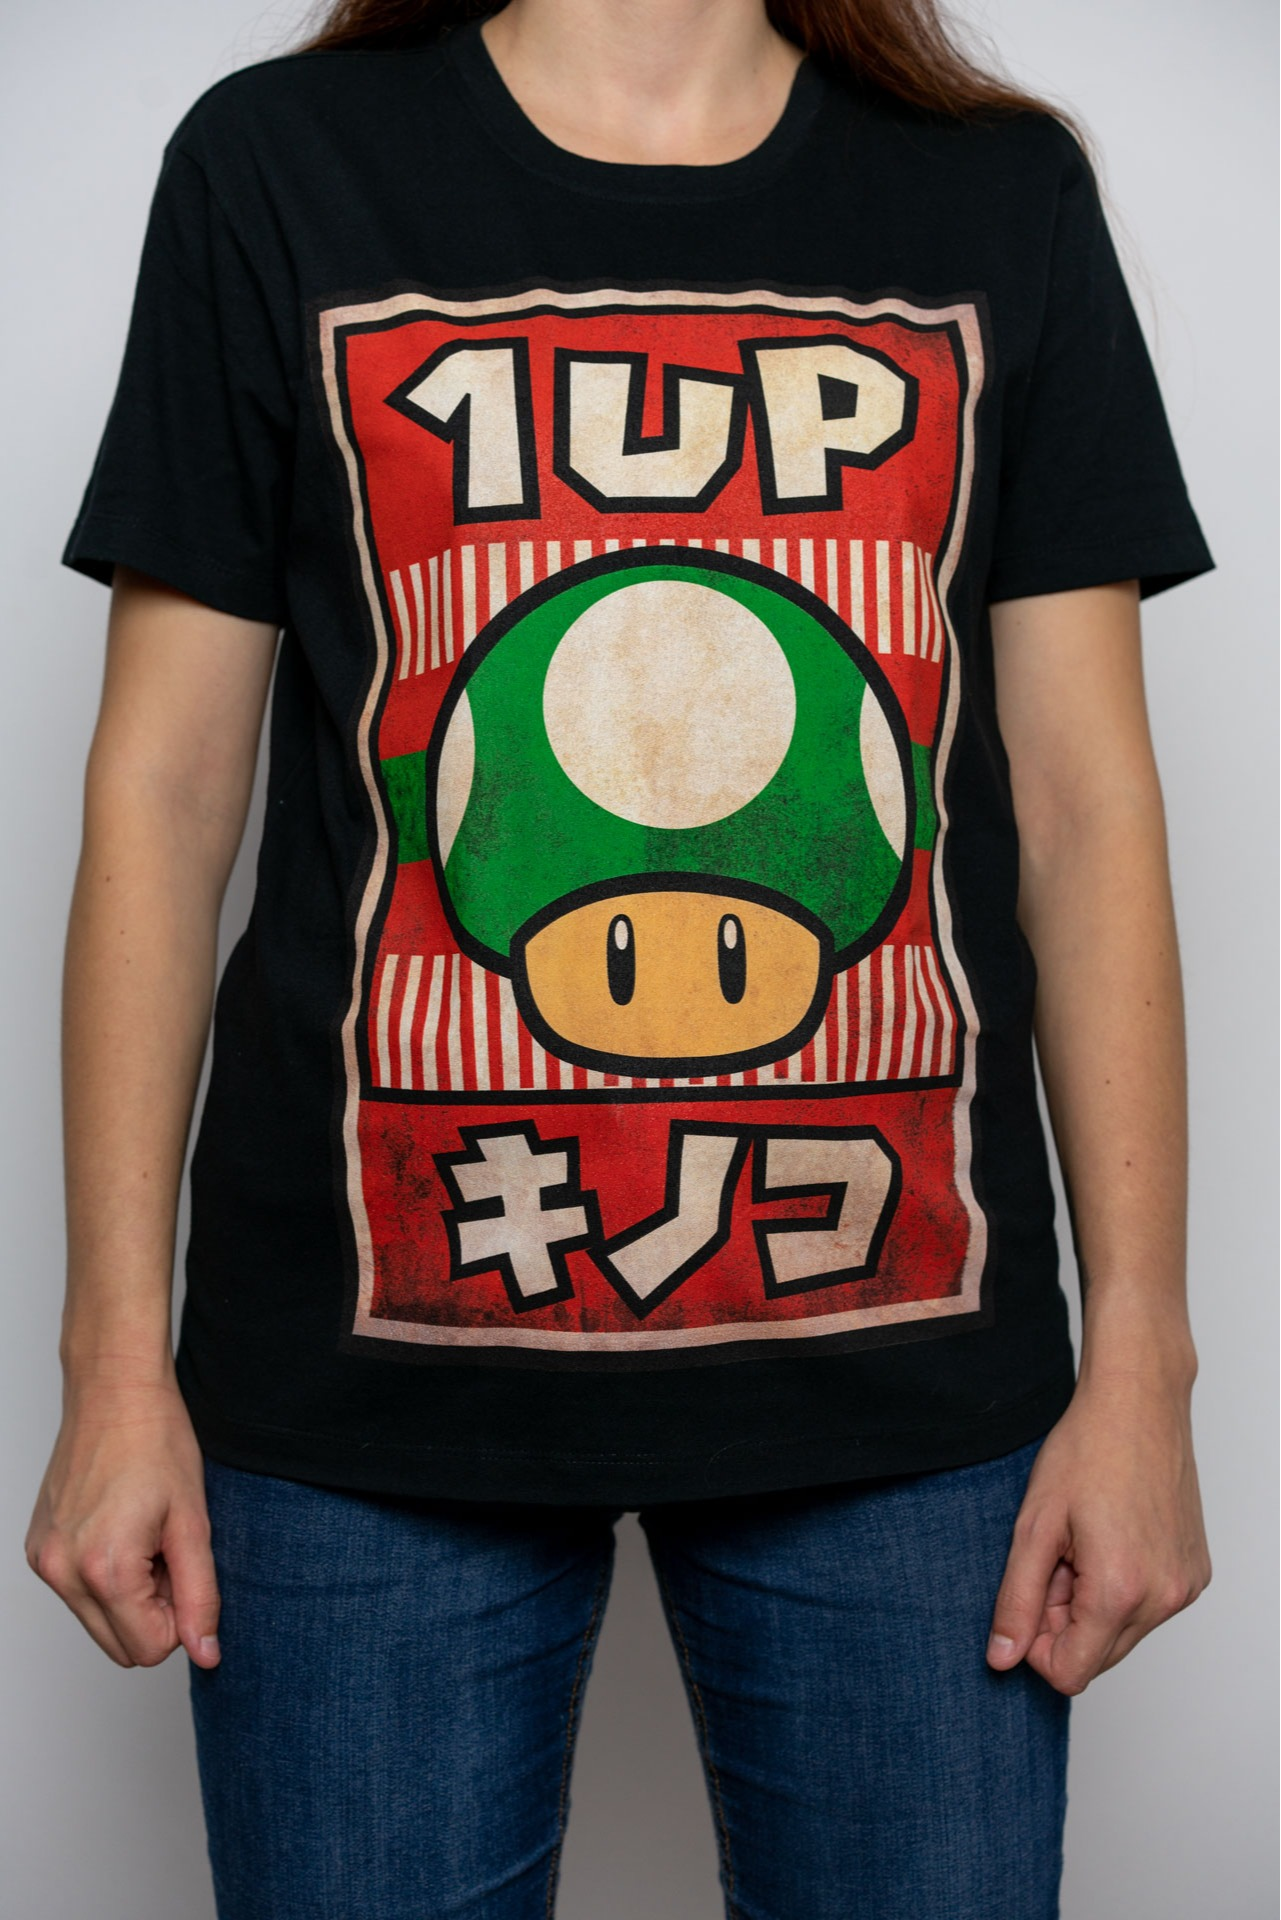 Tričko Nintendo - Propaganda Poster 1-UP Mushroom (velikost S) (PC)